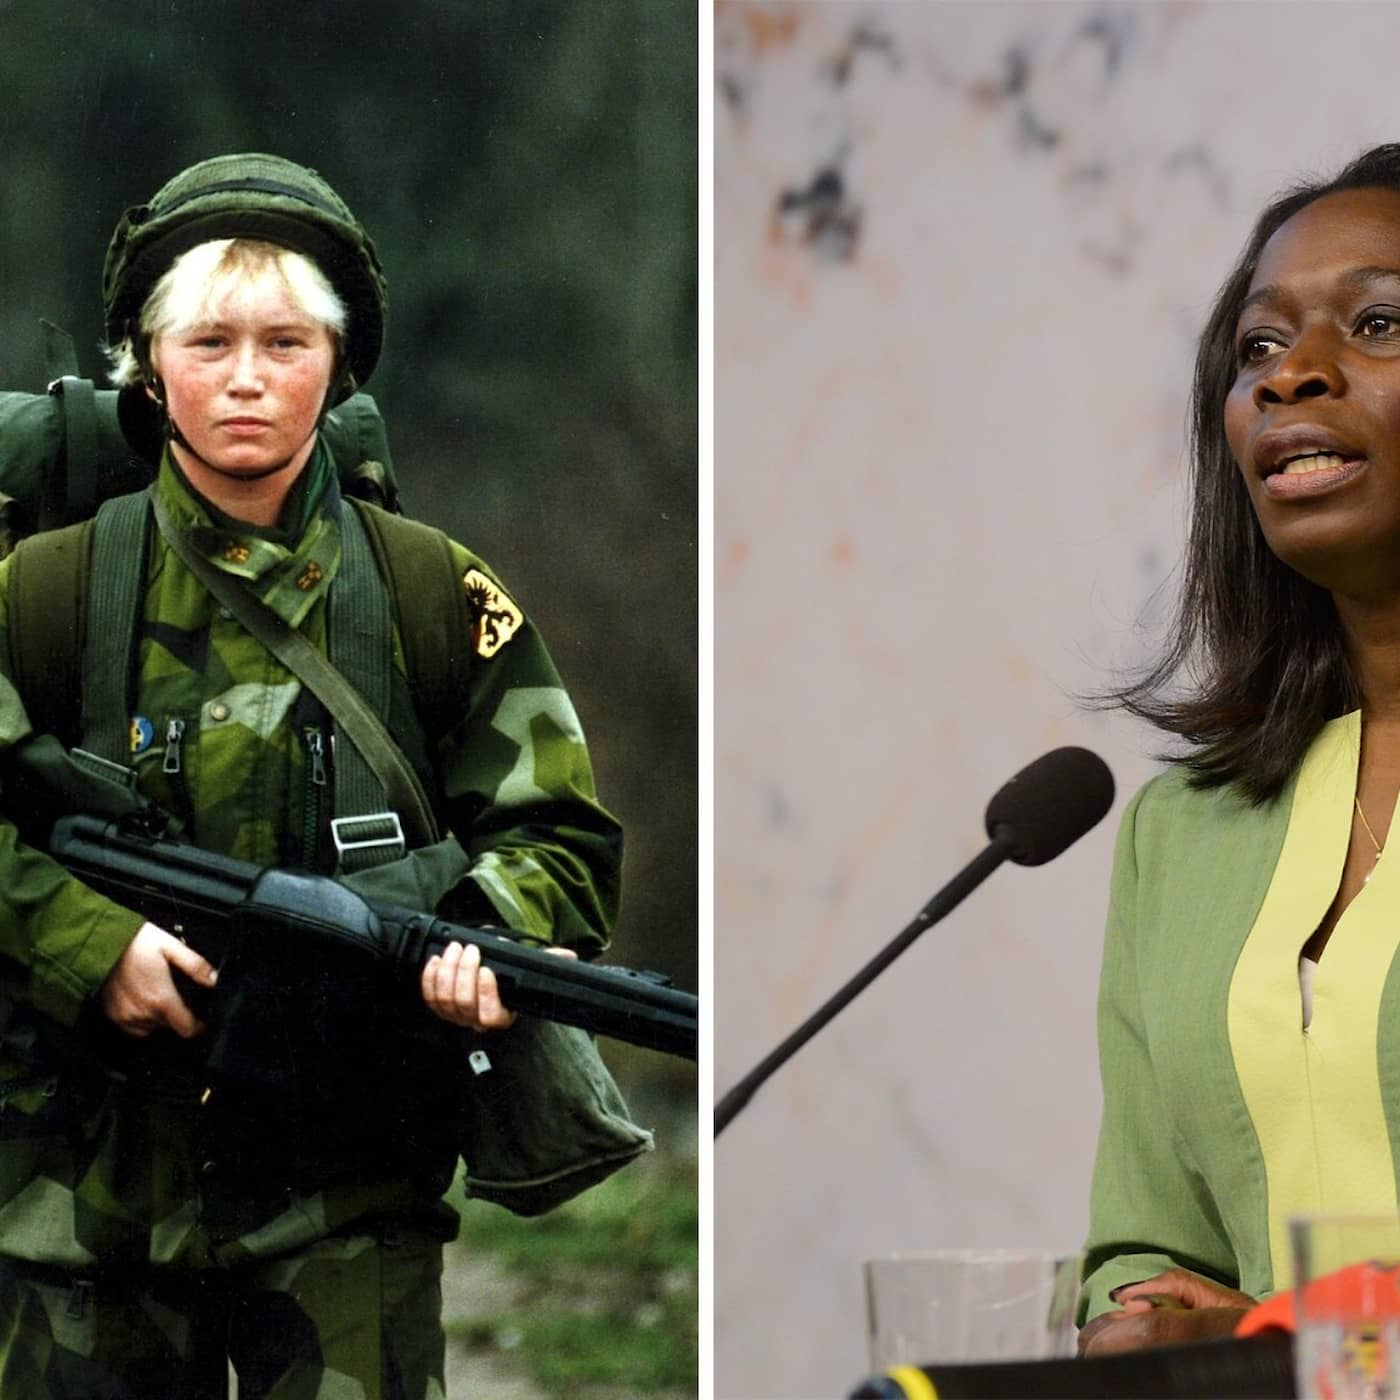 کچان کەمتر بەشداری دەورەکانی هێزی بەرگریی سوید دەکەن. لیبەراڵەکان دەیانەوێت پرسی هاوگوونجی چارەسەر بکەن